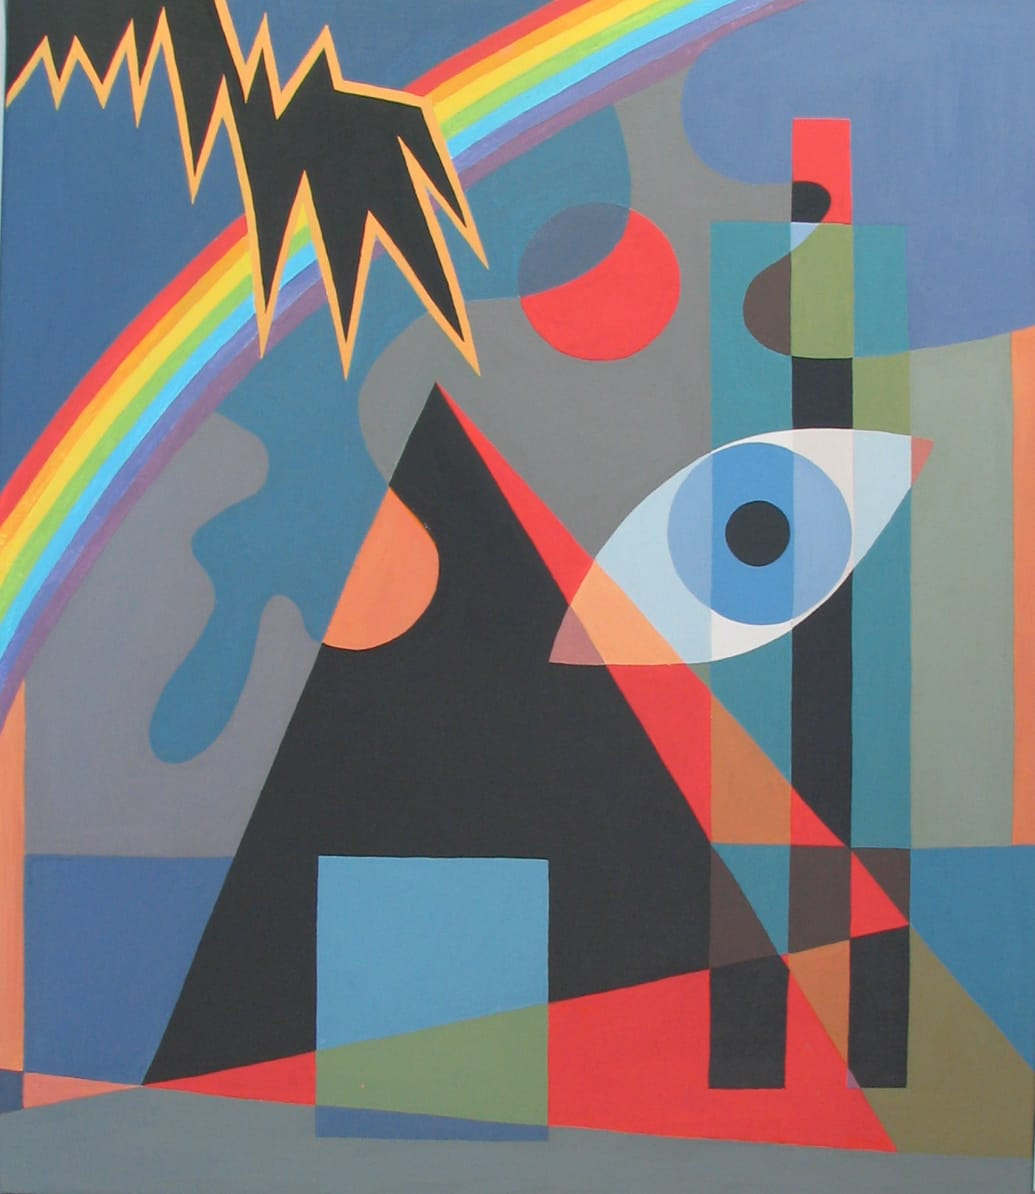 Ilse Petry-Ambrosius: Phänomene (Acryl auf Leinwand, 70x60 cm)